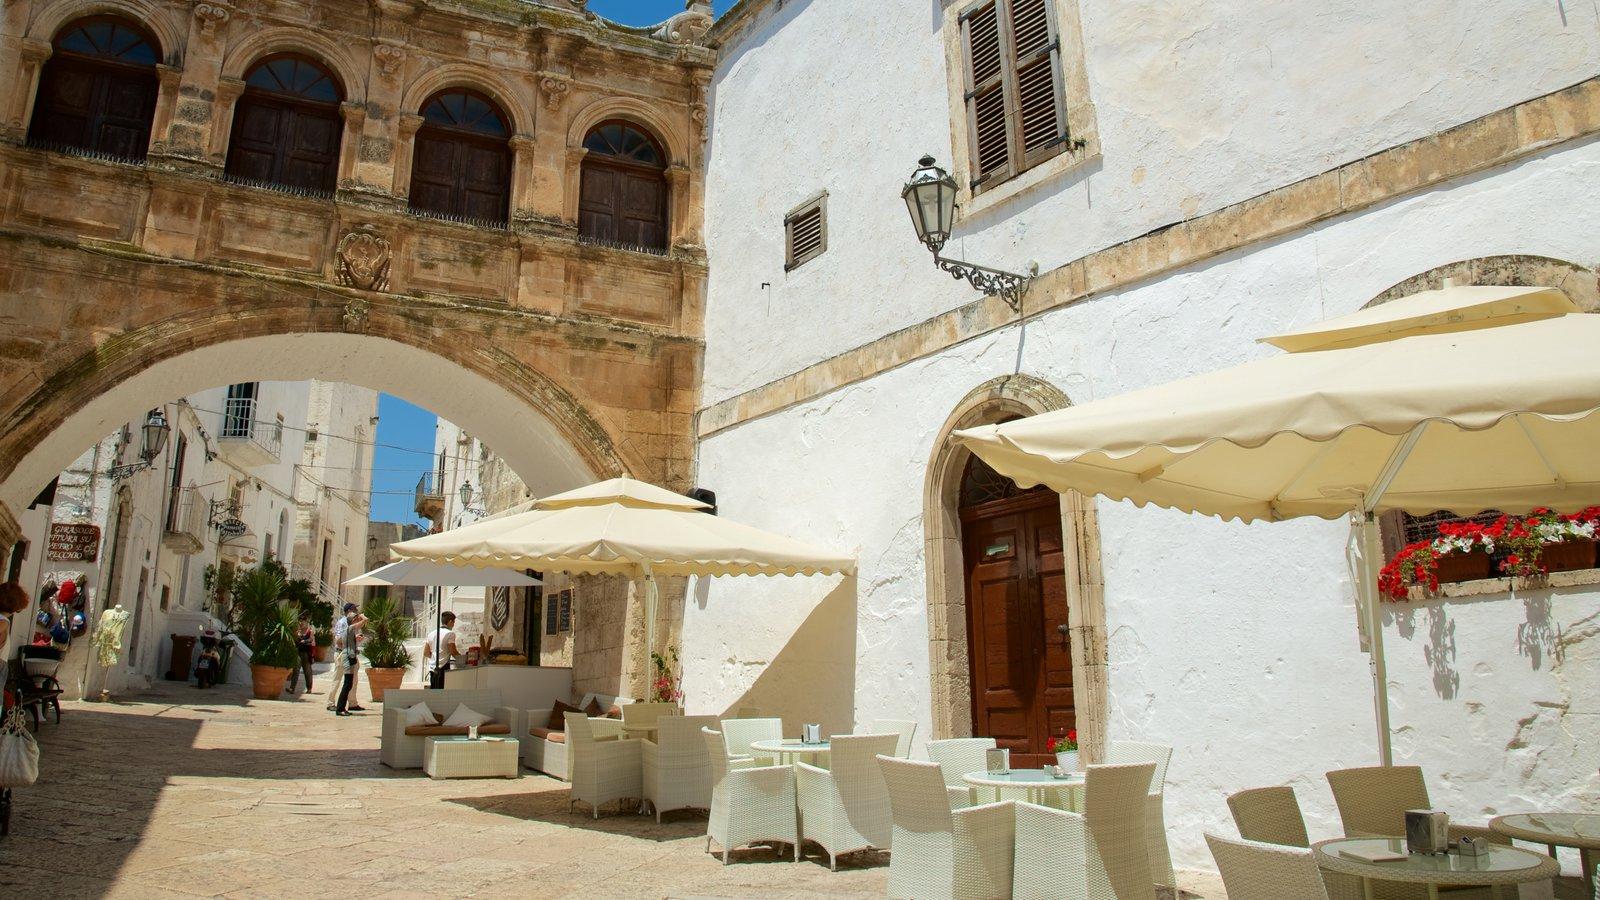 Brindisi featuring heritage architecture